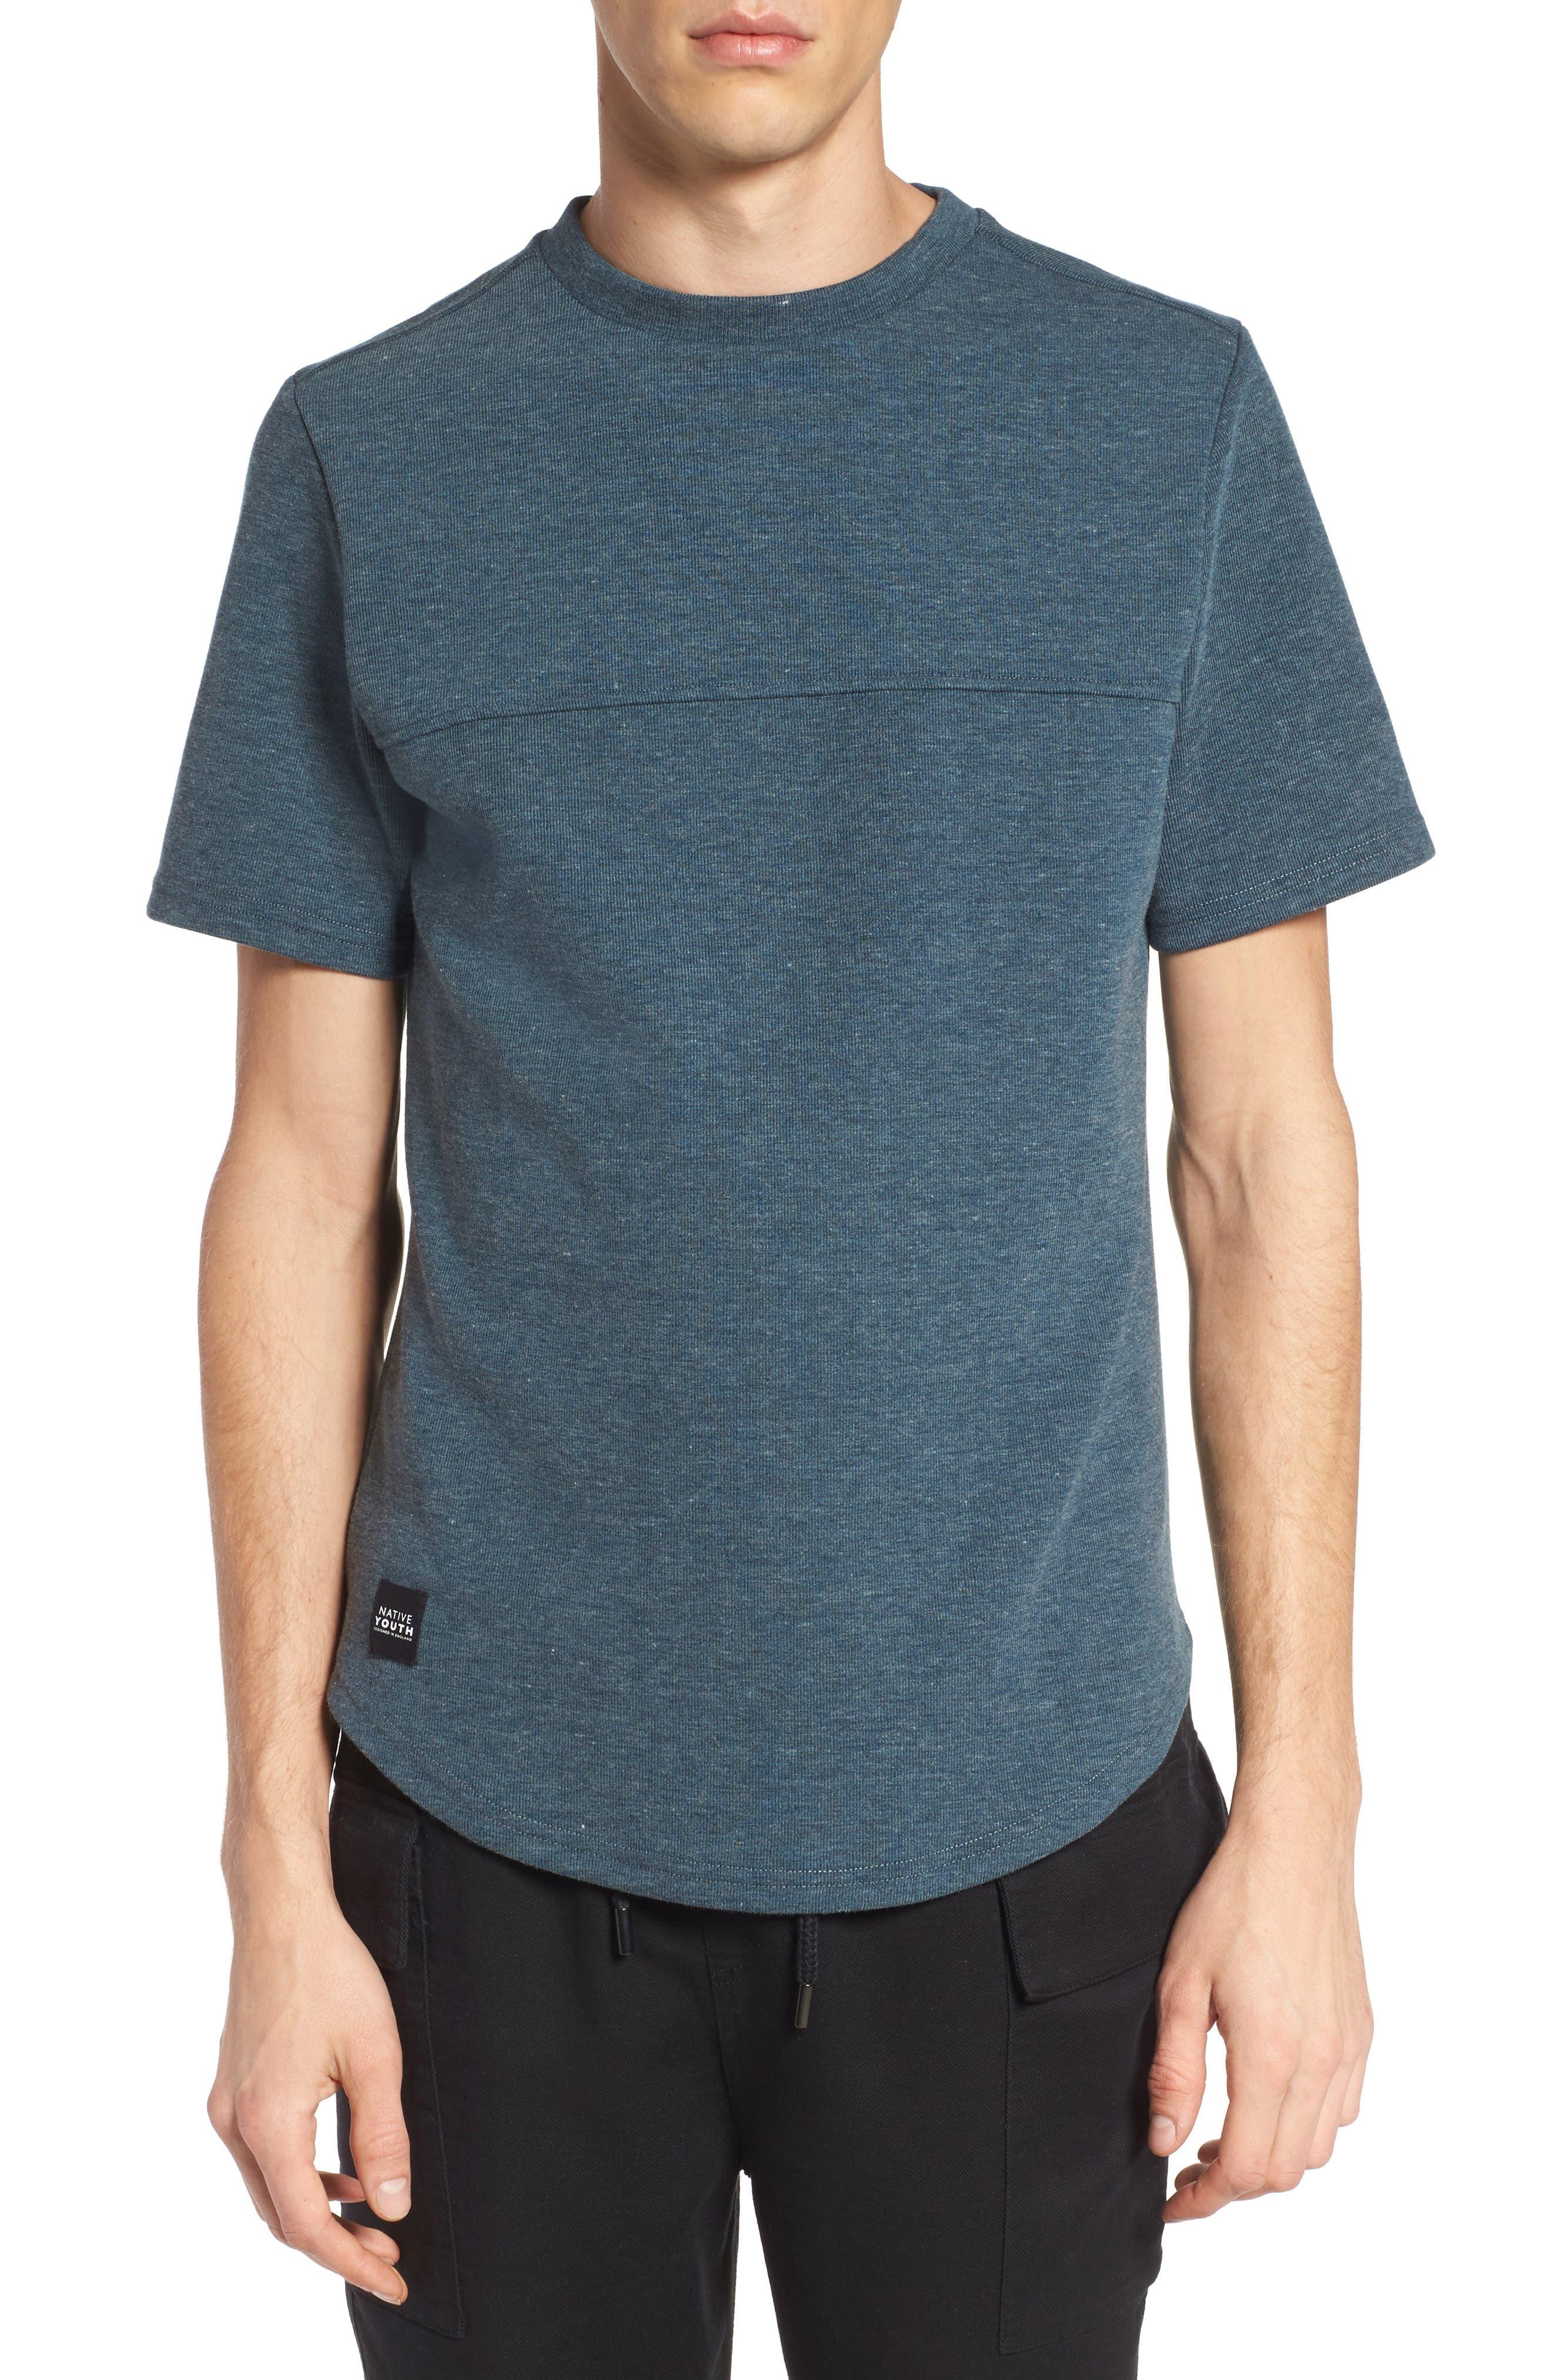 Onyx T-Shirt,                             Main thumbnail 1, color,                             440